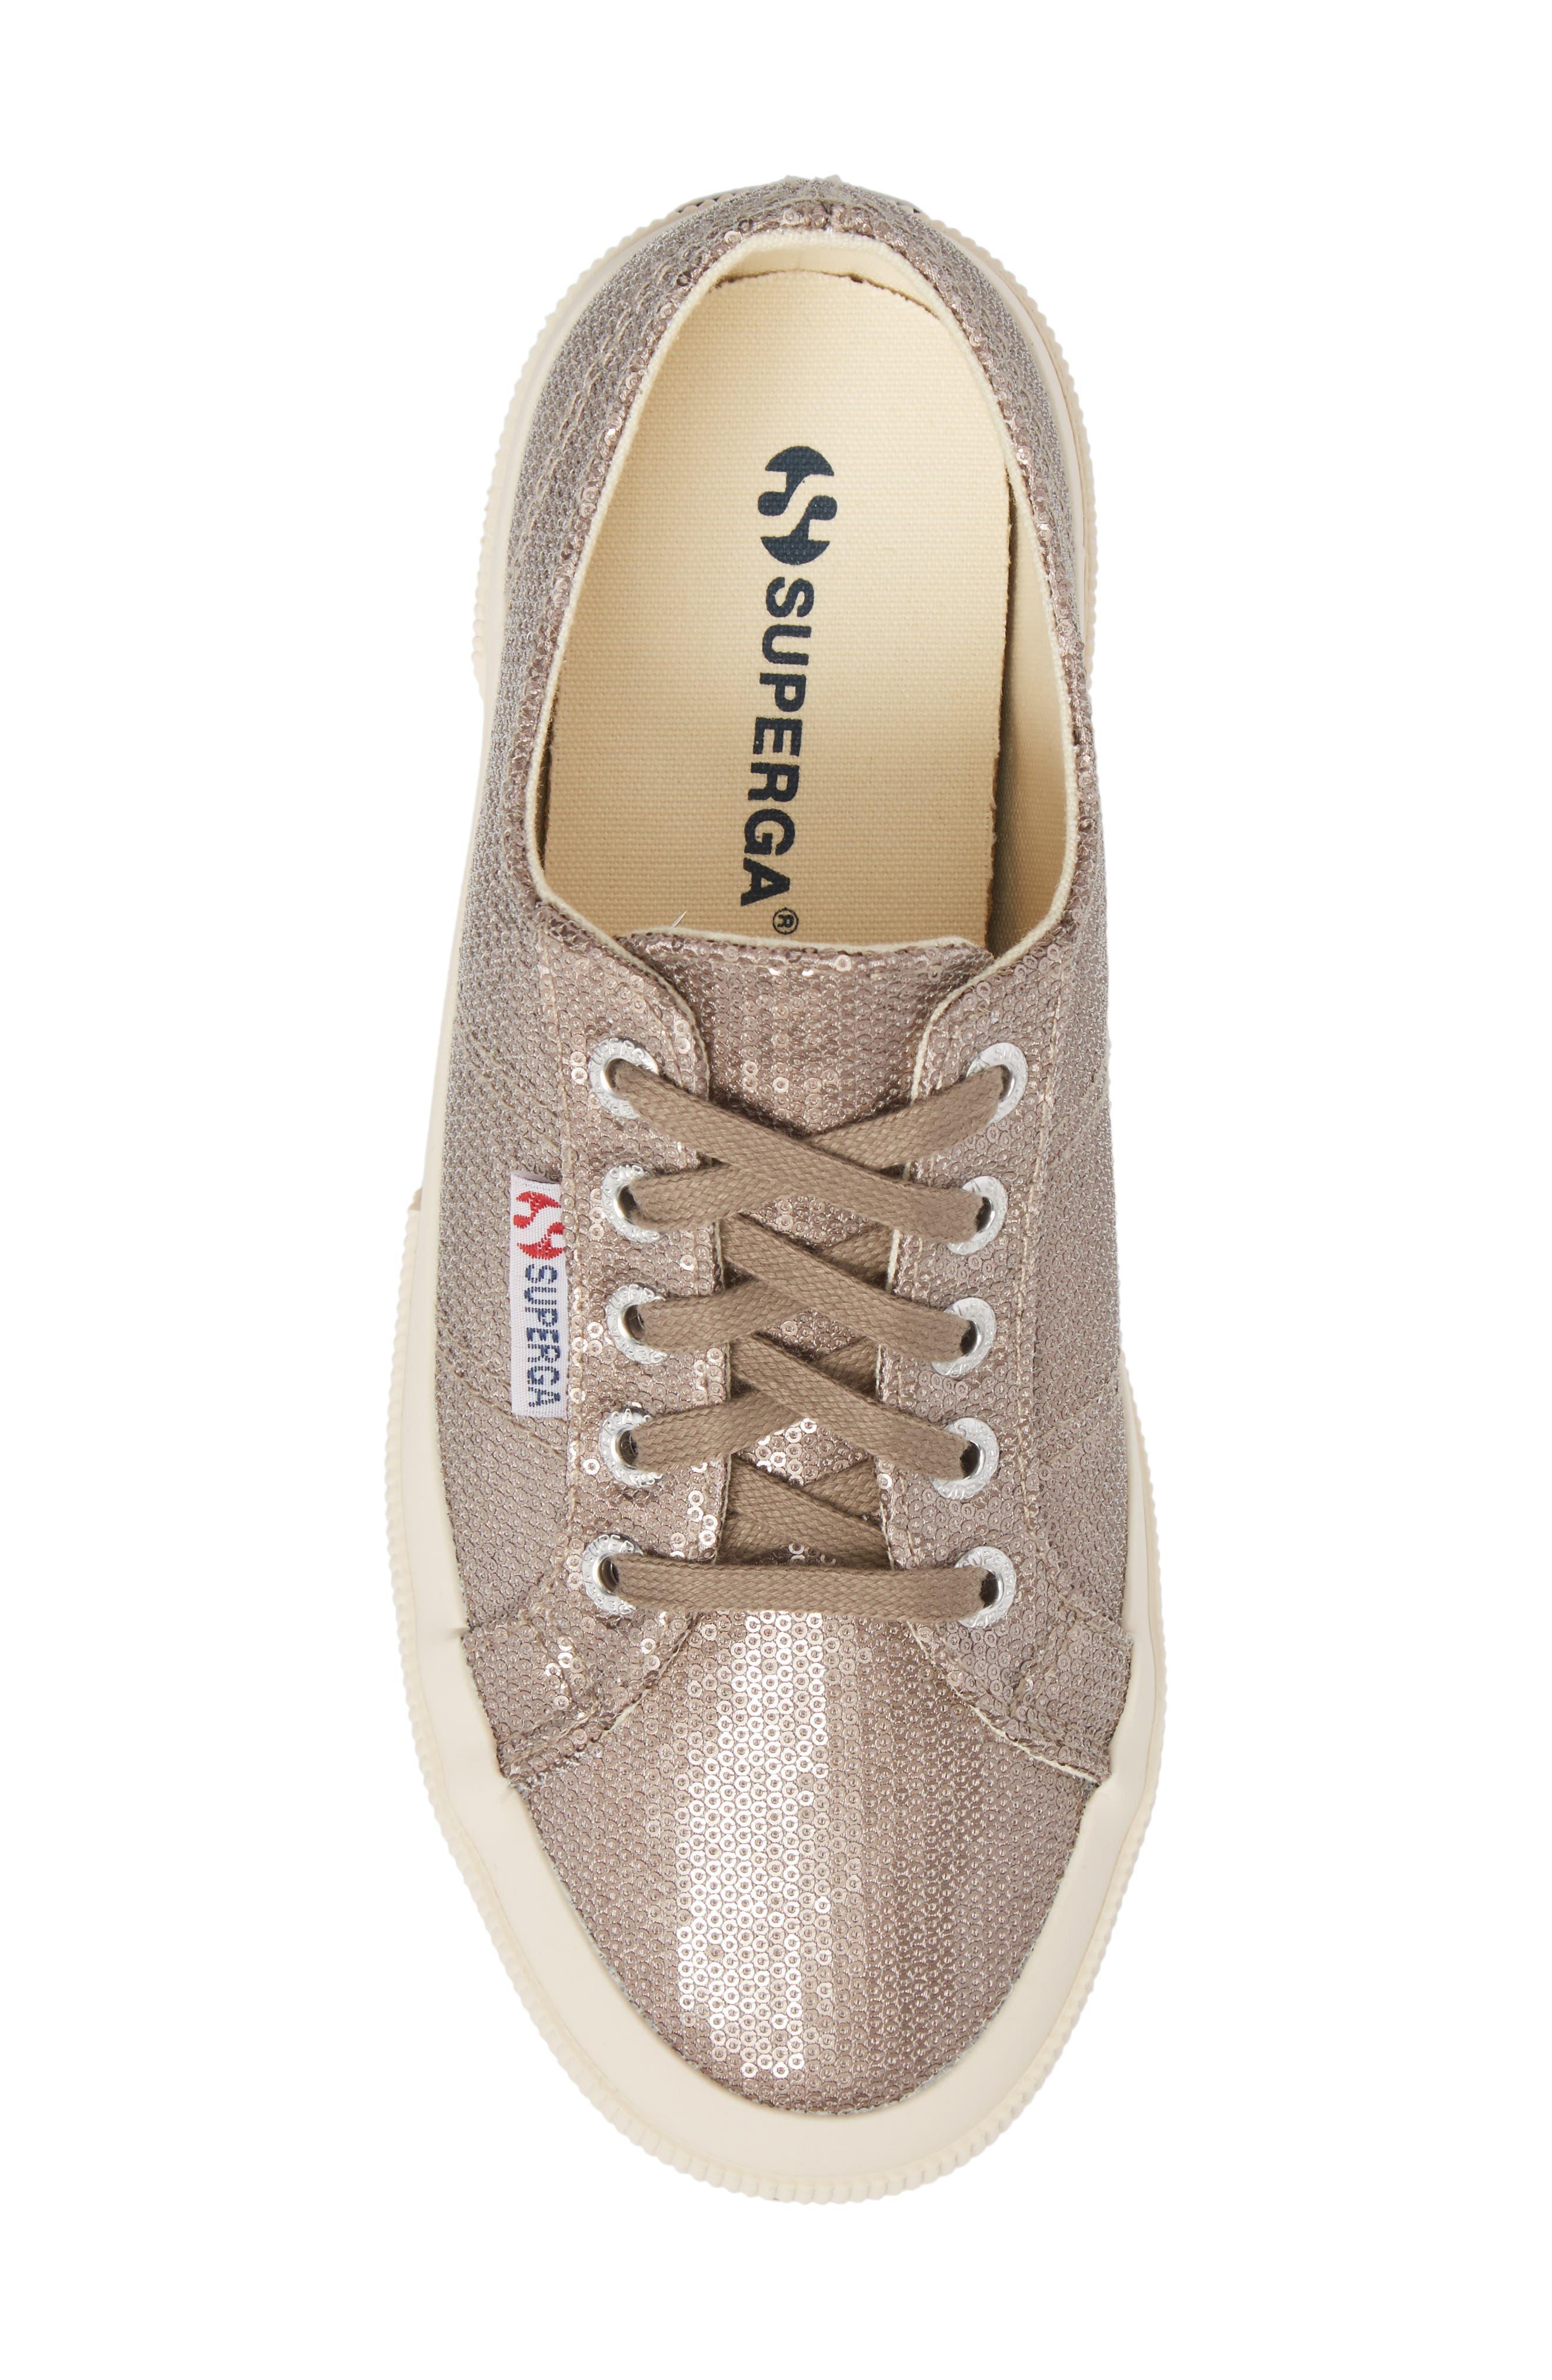 2750 Micro Sequin Sneaker,                             Alternate thumbnail 5, color,                             Bronze